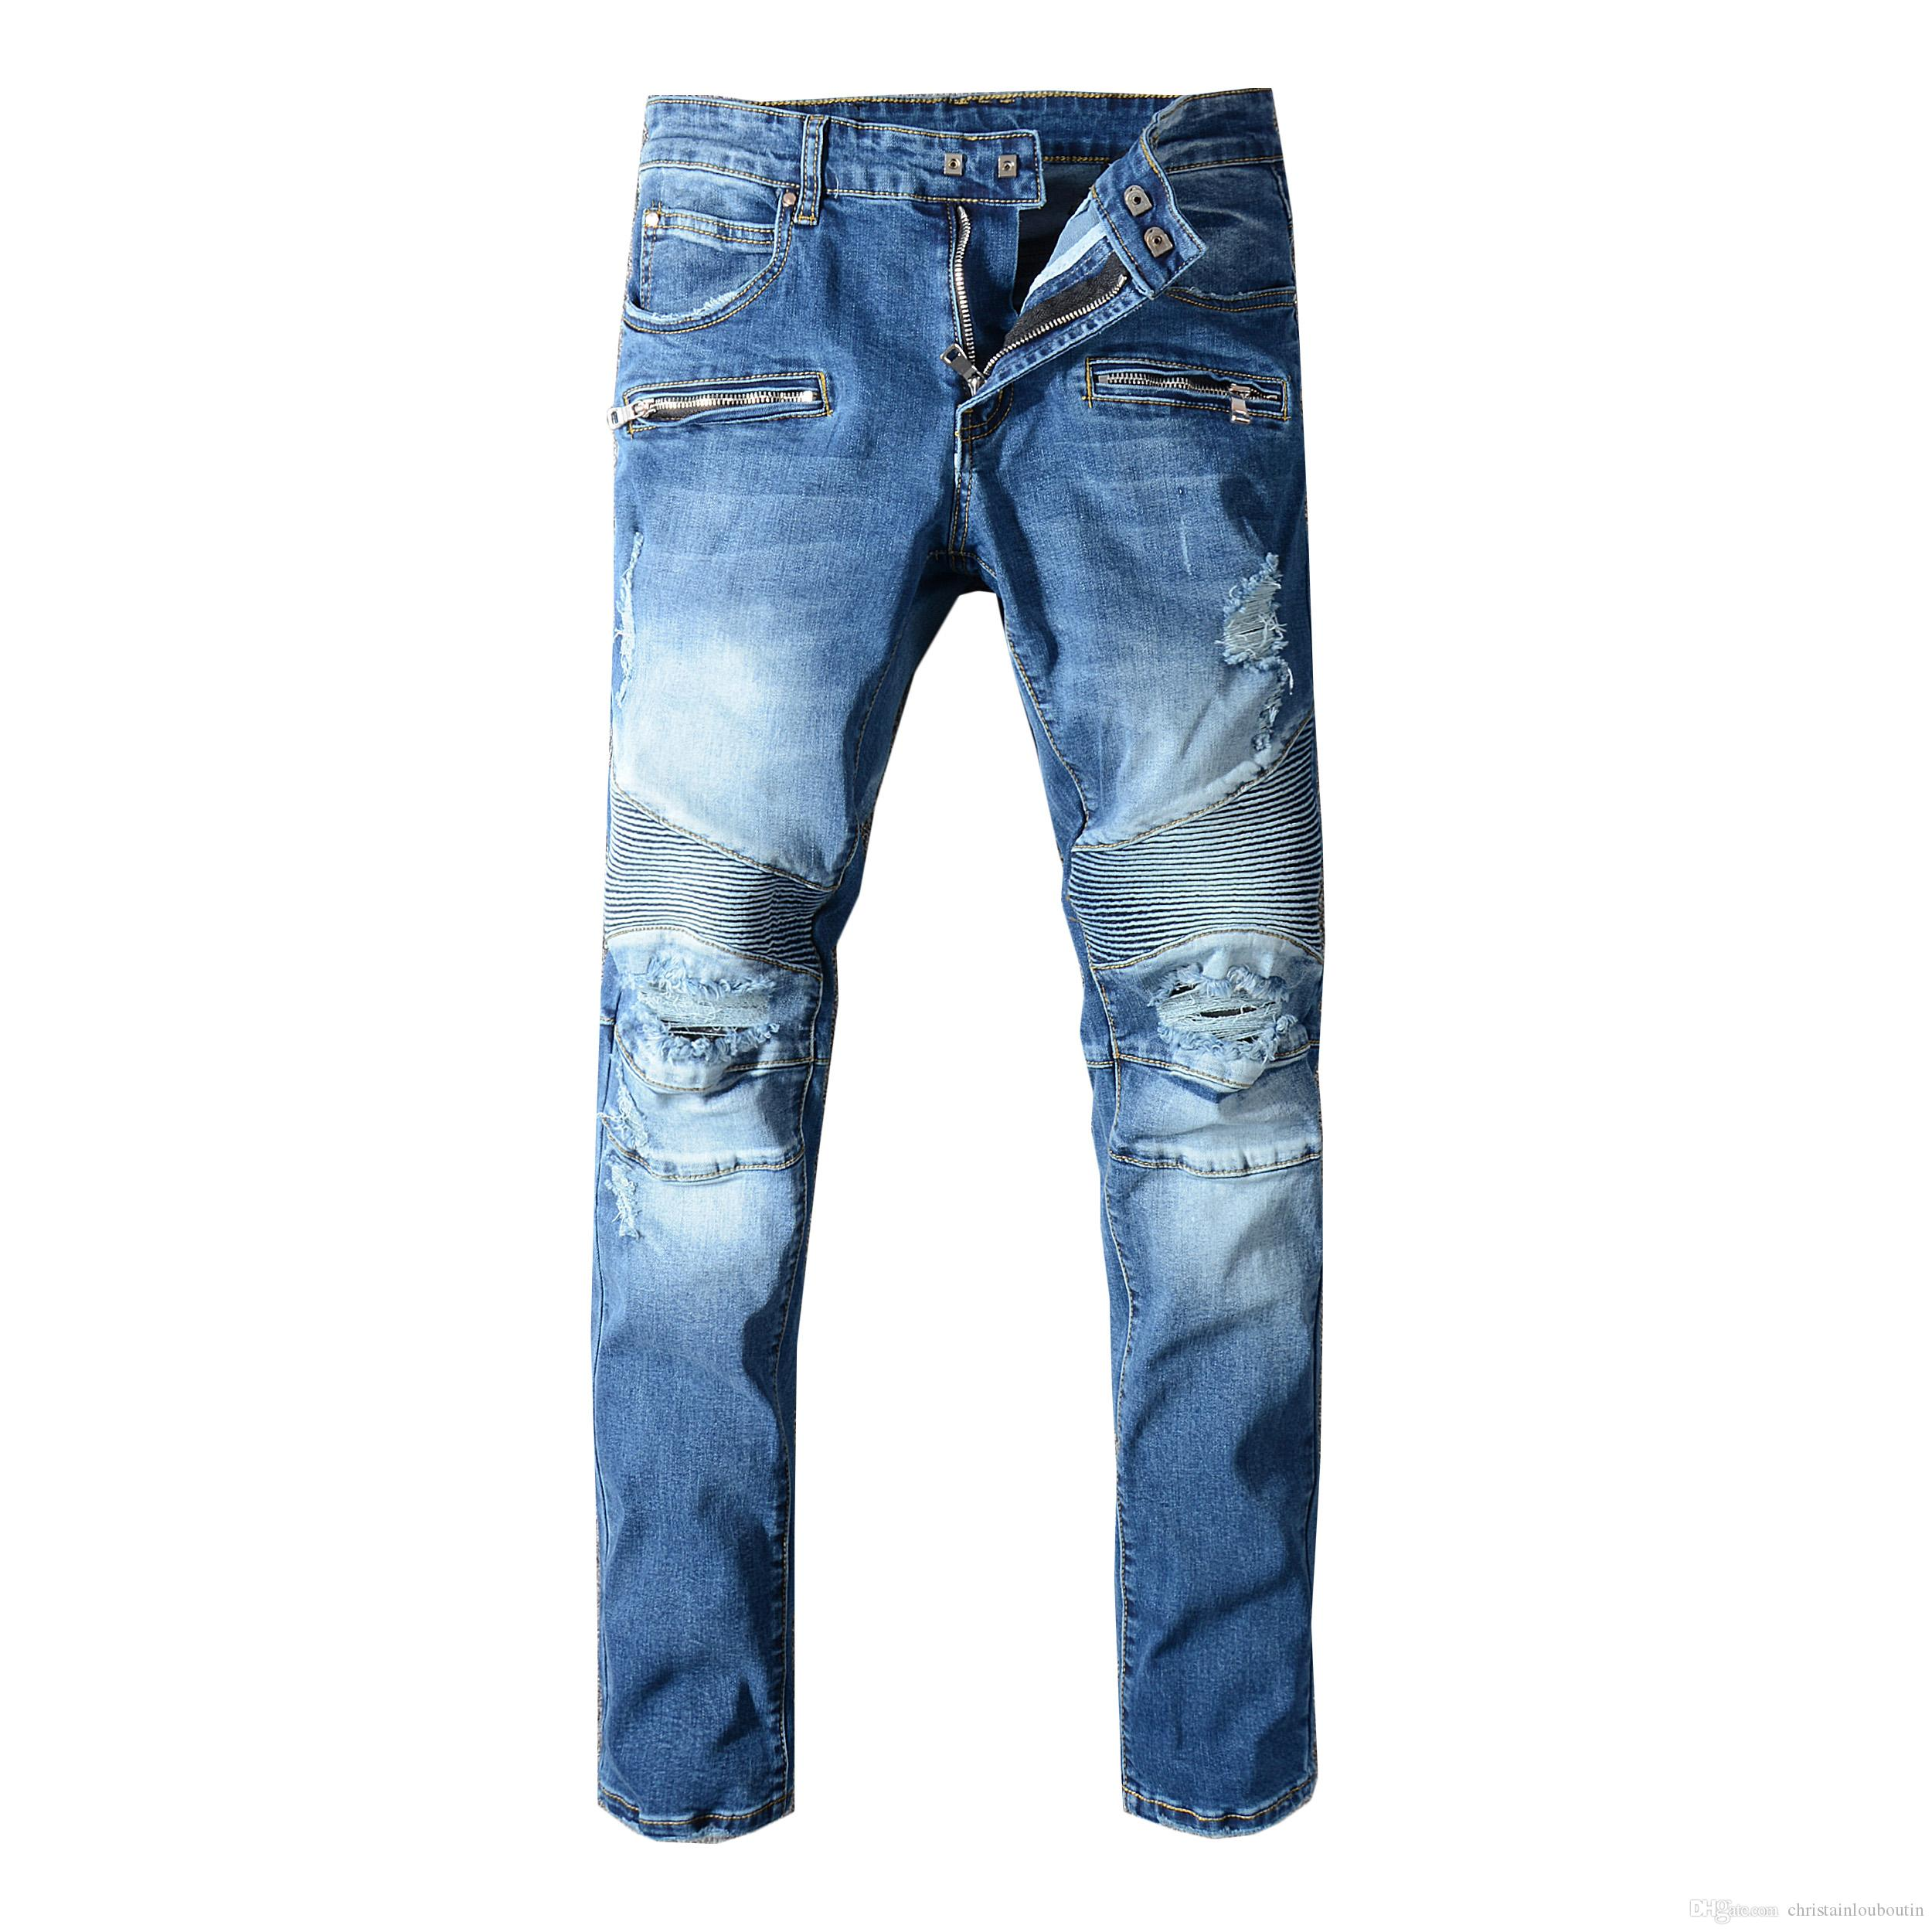 95778e61964 2019 2019 Balmain Men Distressed Ripped Jeans Fashion Designer ...